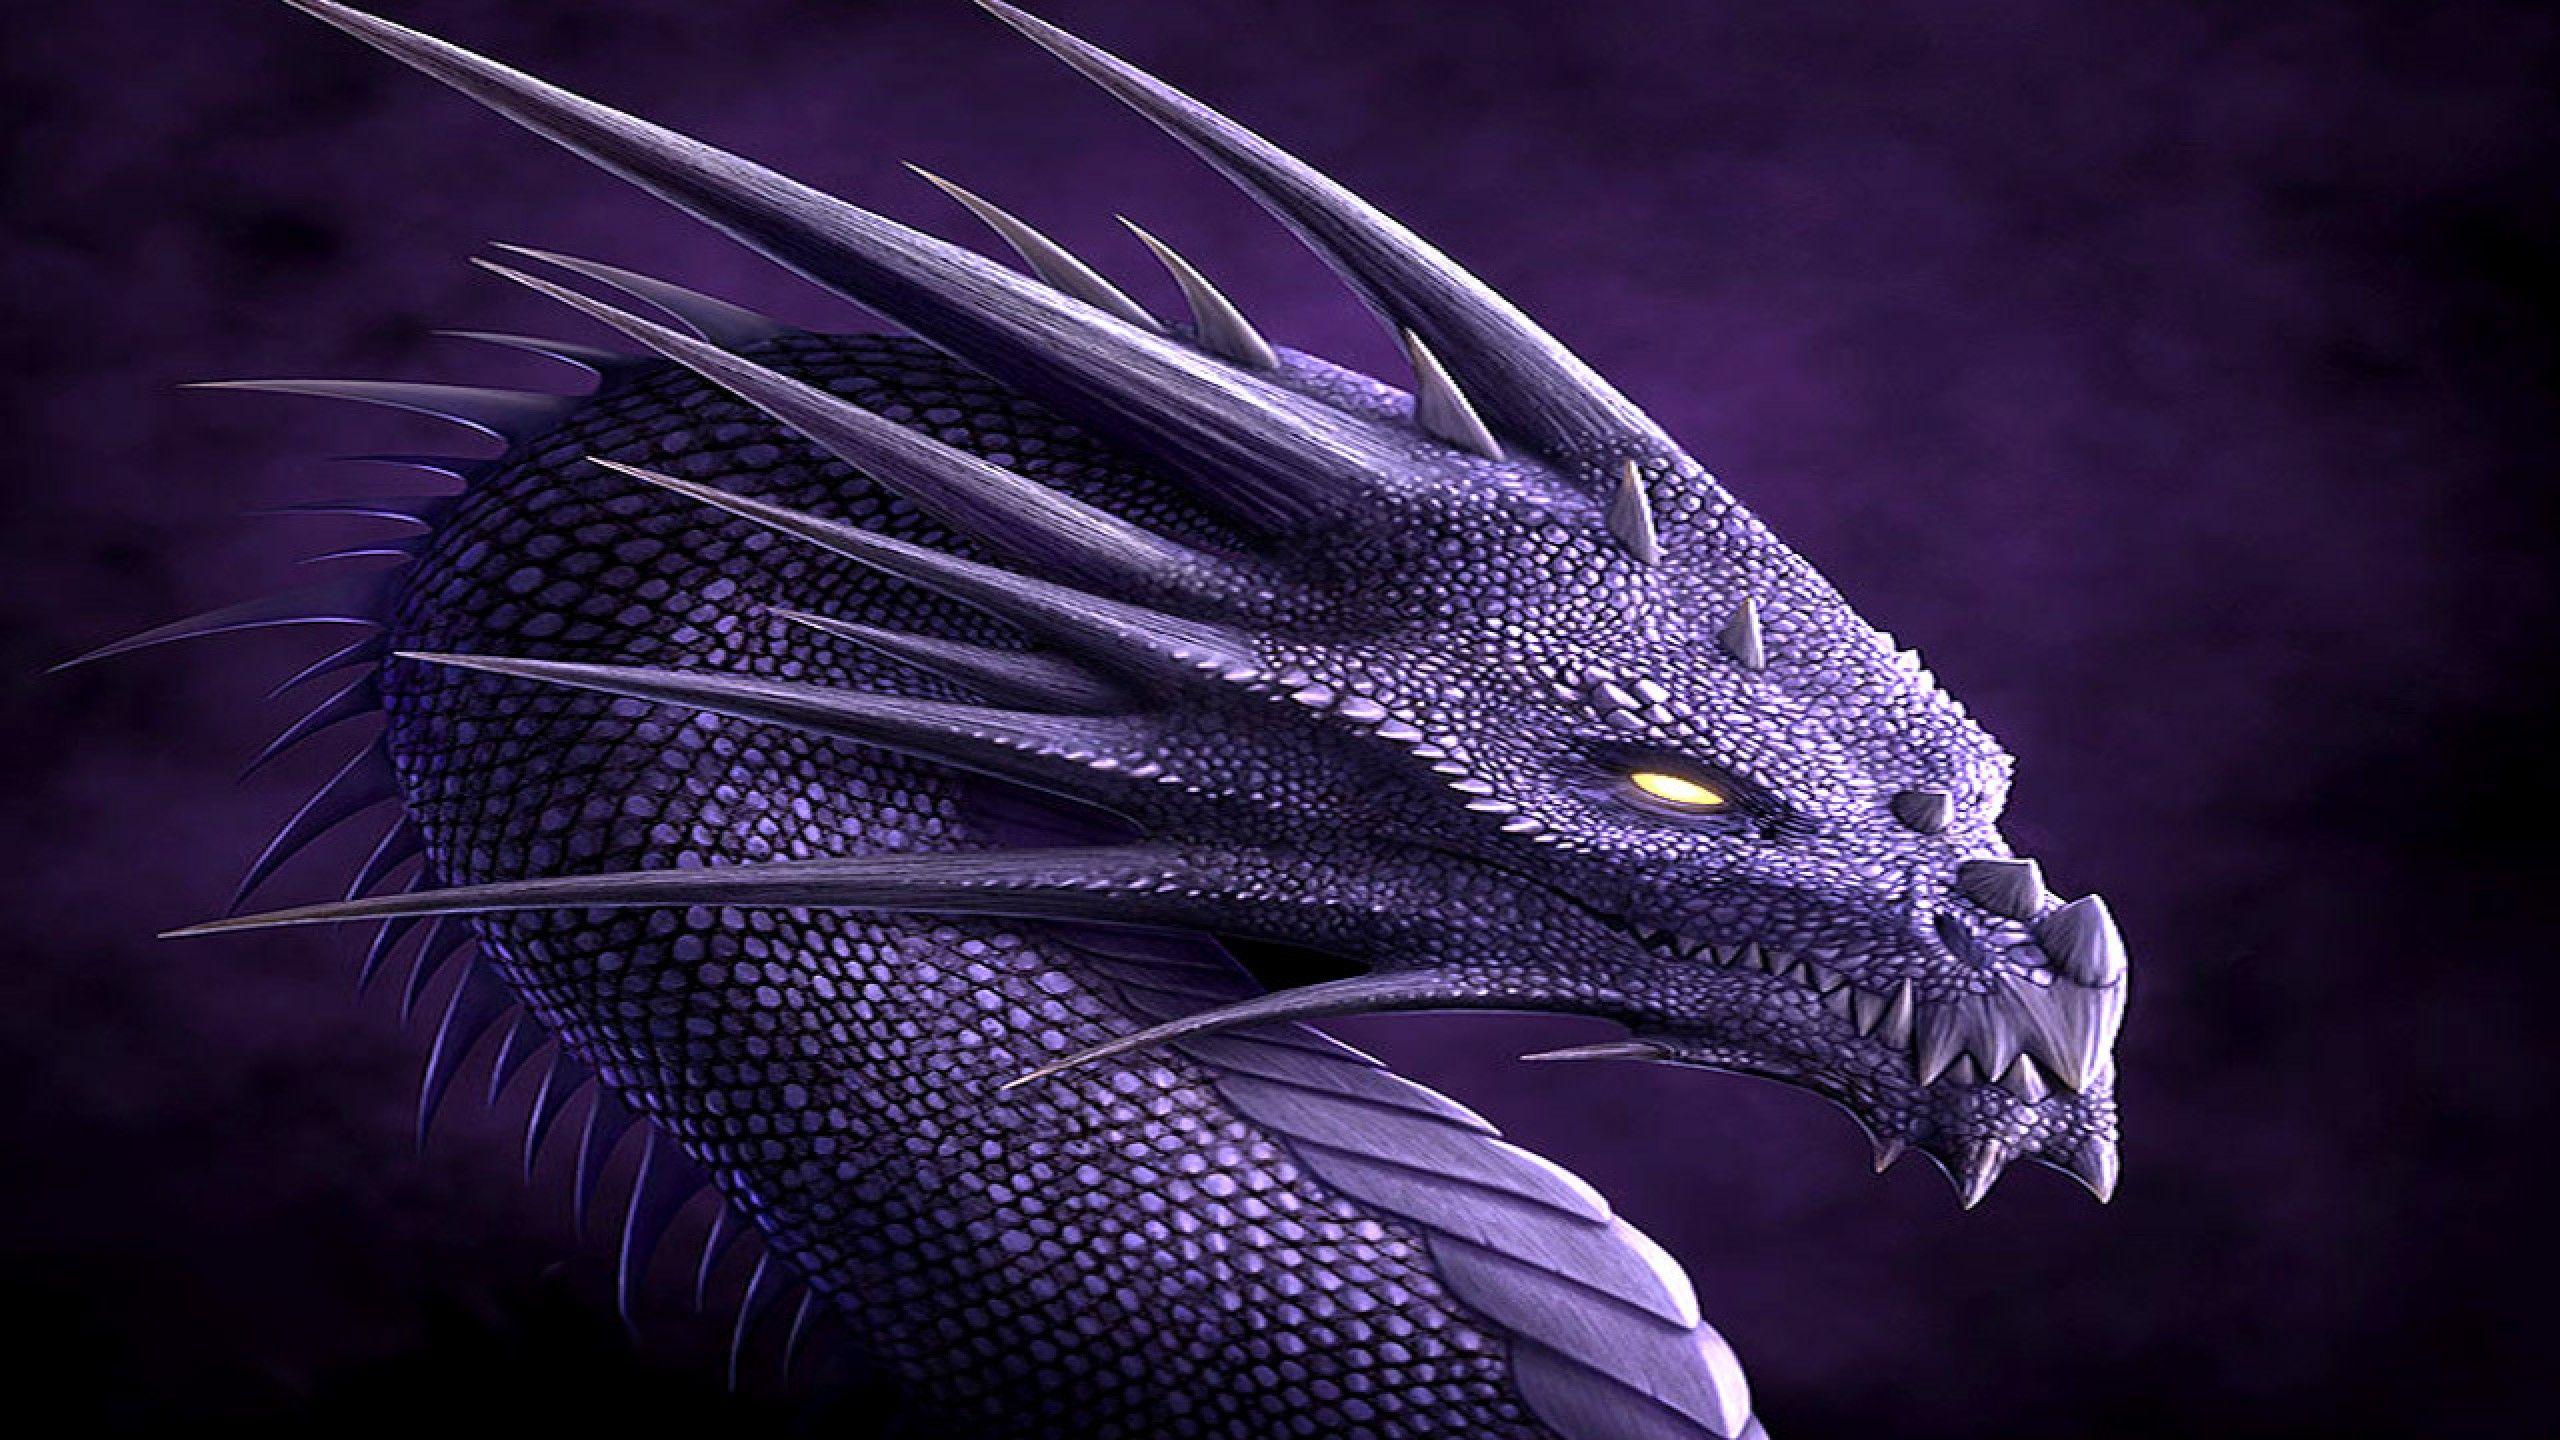 49+ 1080P Dragon Wallpaper on WallpaperSafari